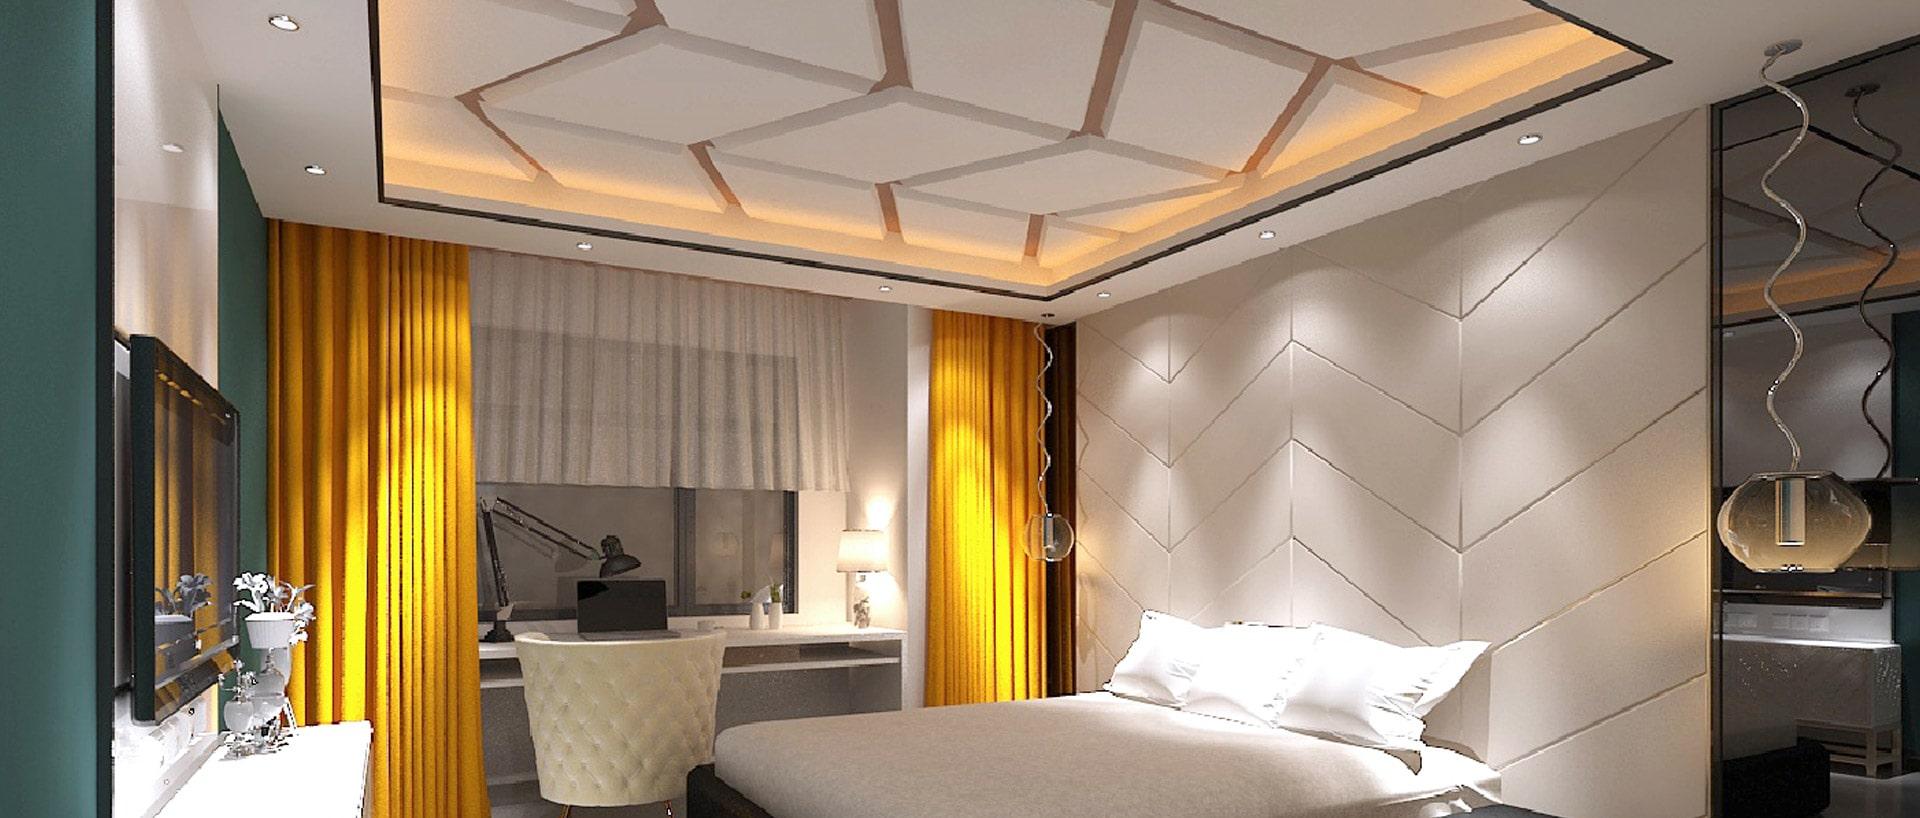 10 Modern Gypsum Bedroom Ceiling Design Photos   Catholique Ceiling